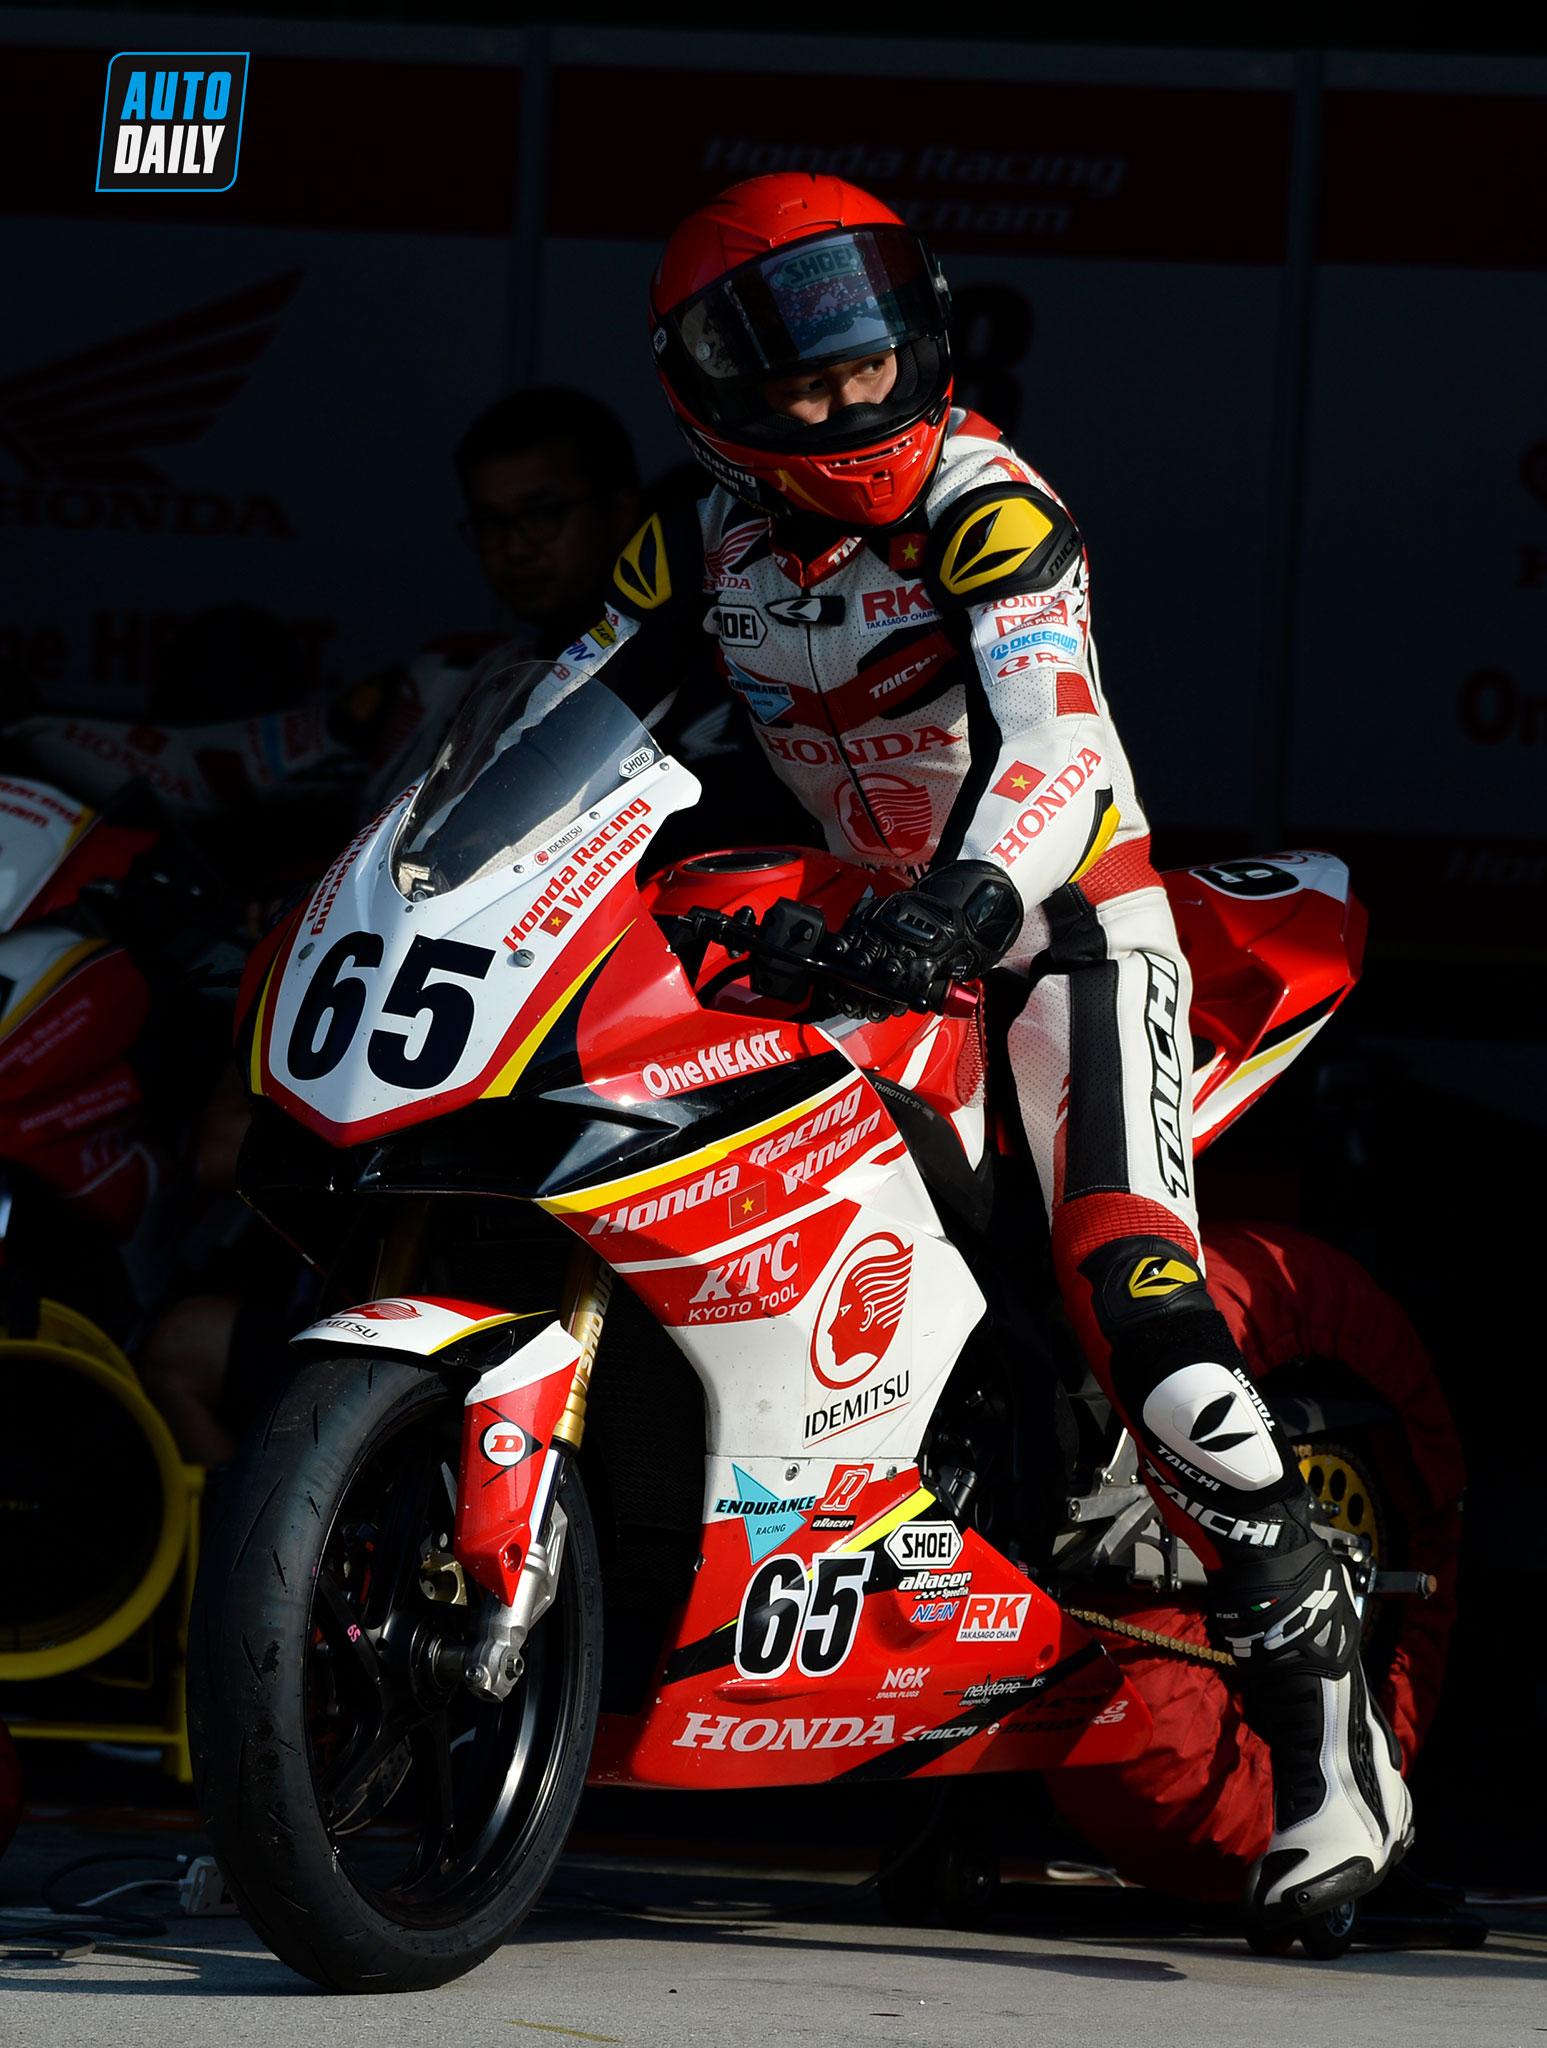 honda-racing-vietnam-arrc-chang-1-autodaily-02.jpg